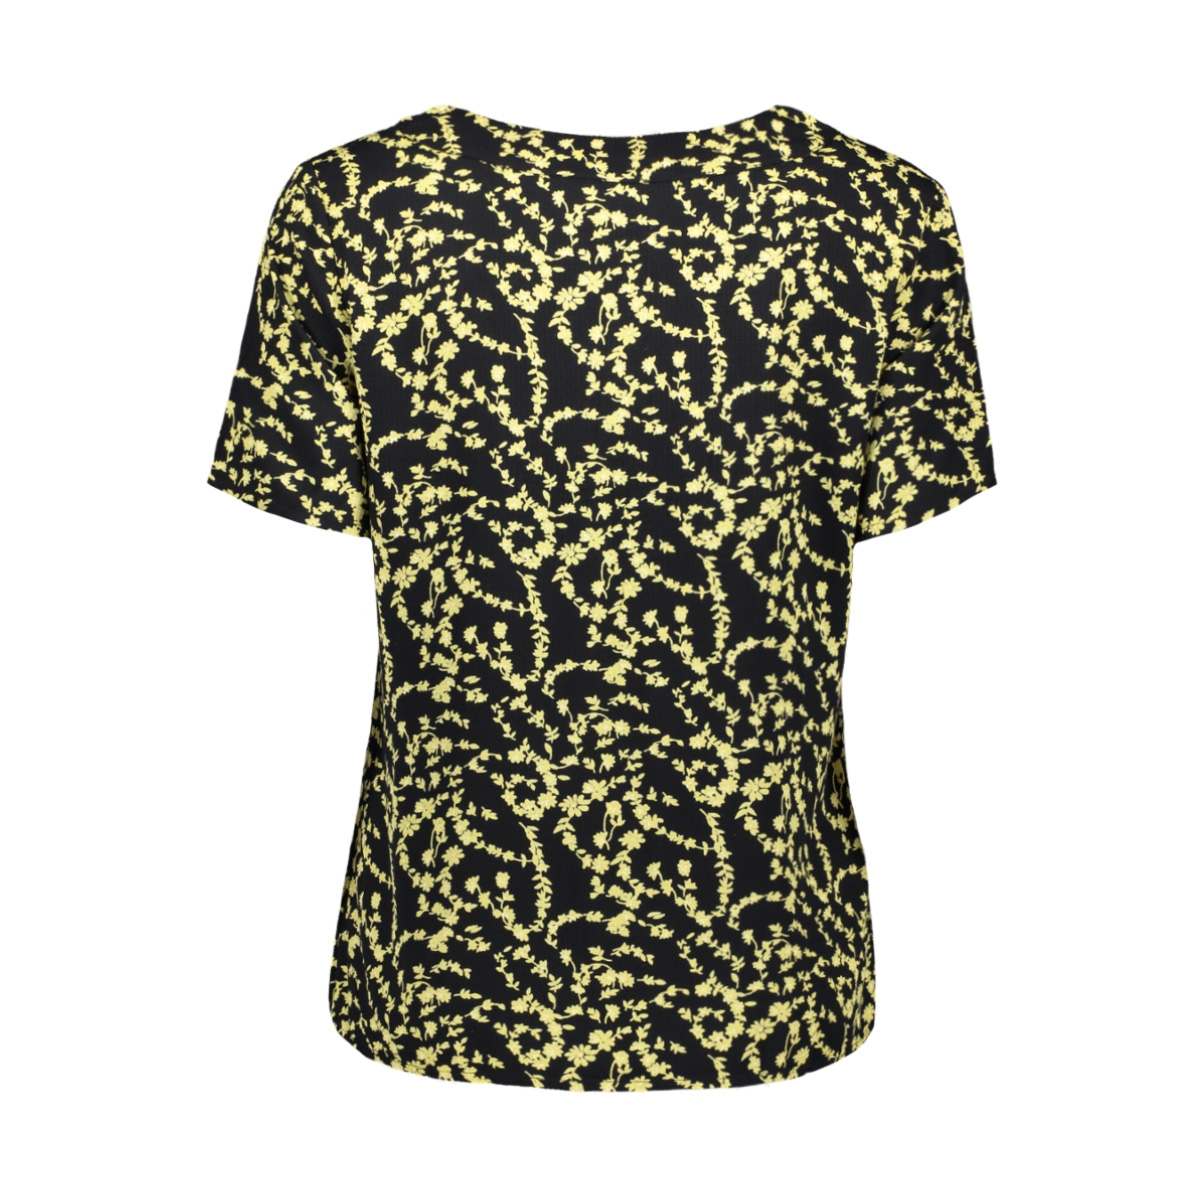 pcnadin ss top 17101854 pieces t-shirt black/silhouette flower